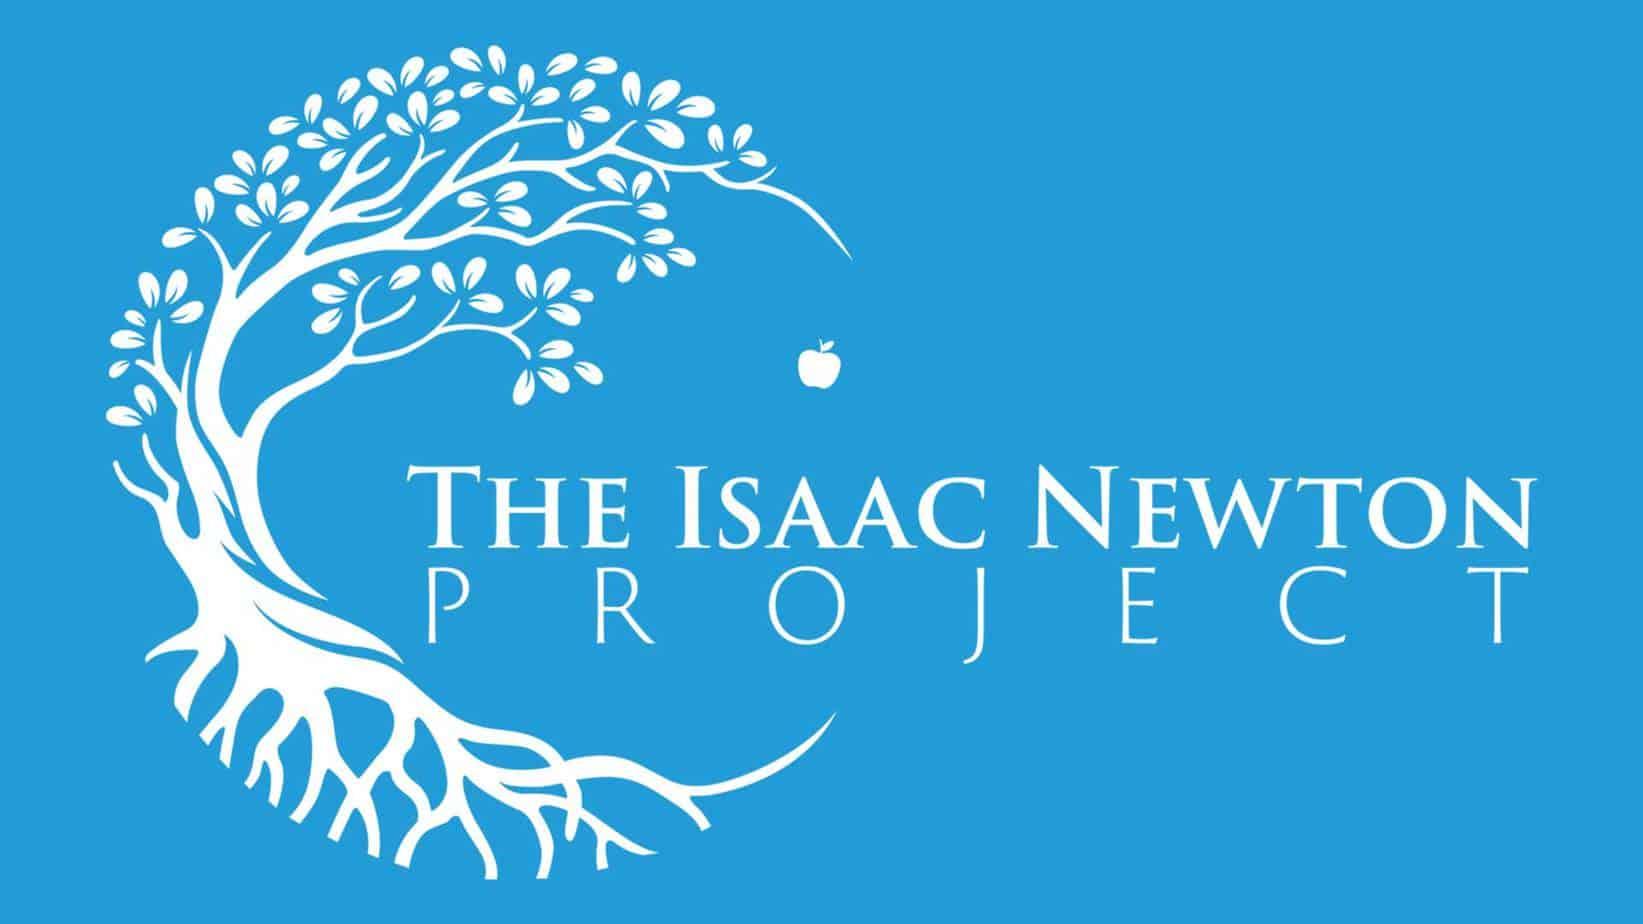 Quarantine Blues? How the Historic Example of Isaac Newton Still Inspires